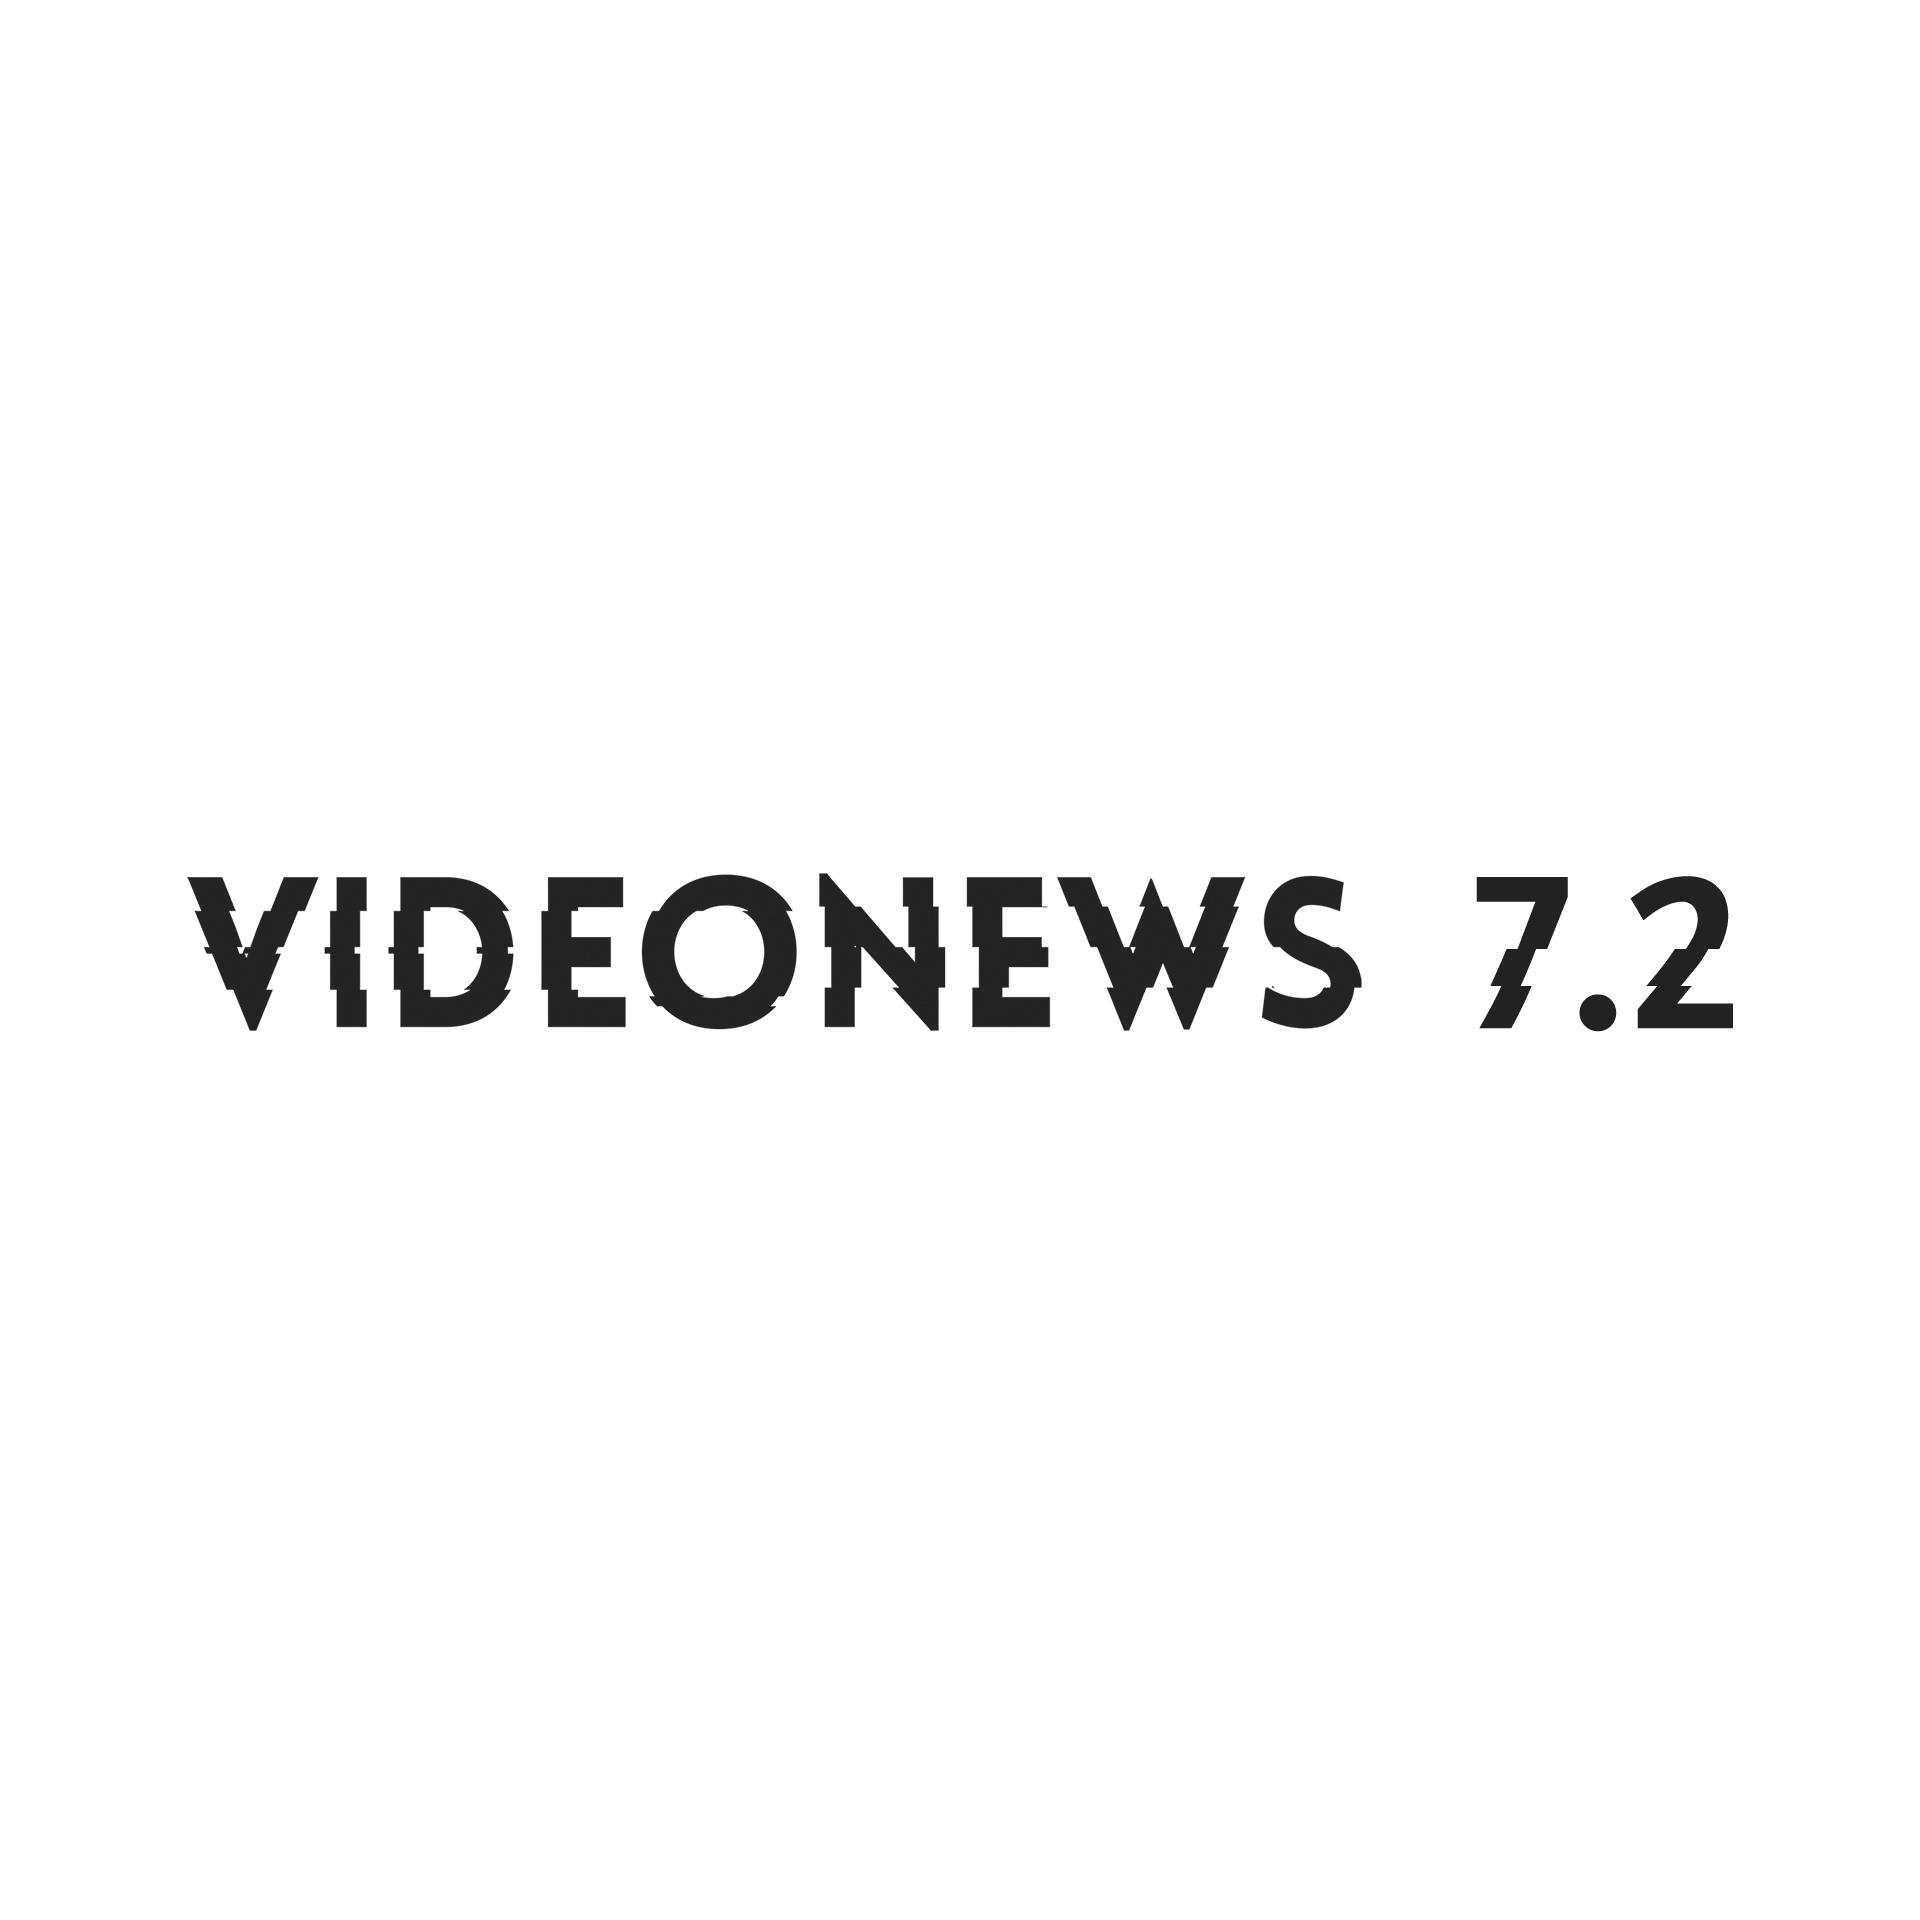 VideoNews 7.2